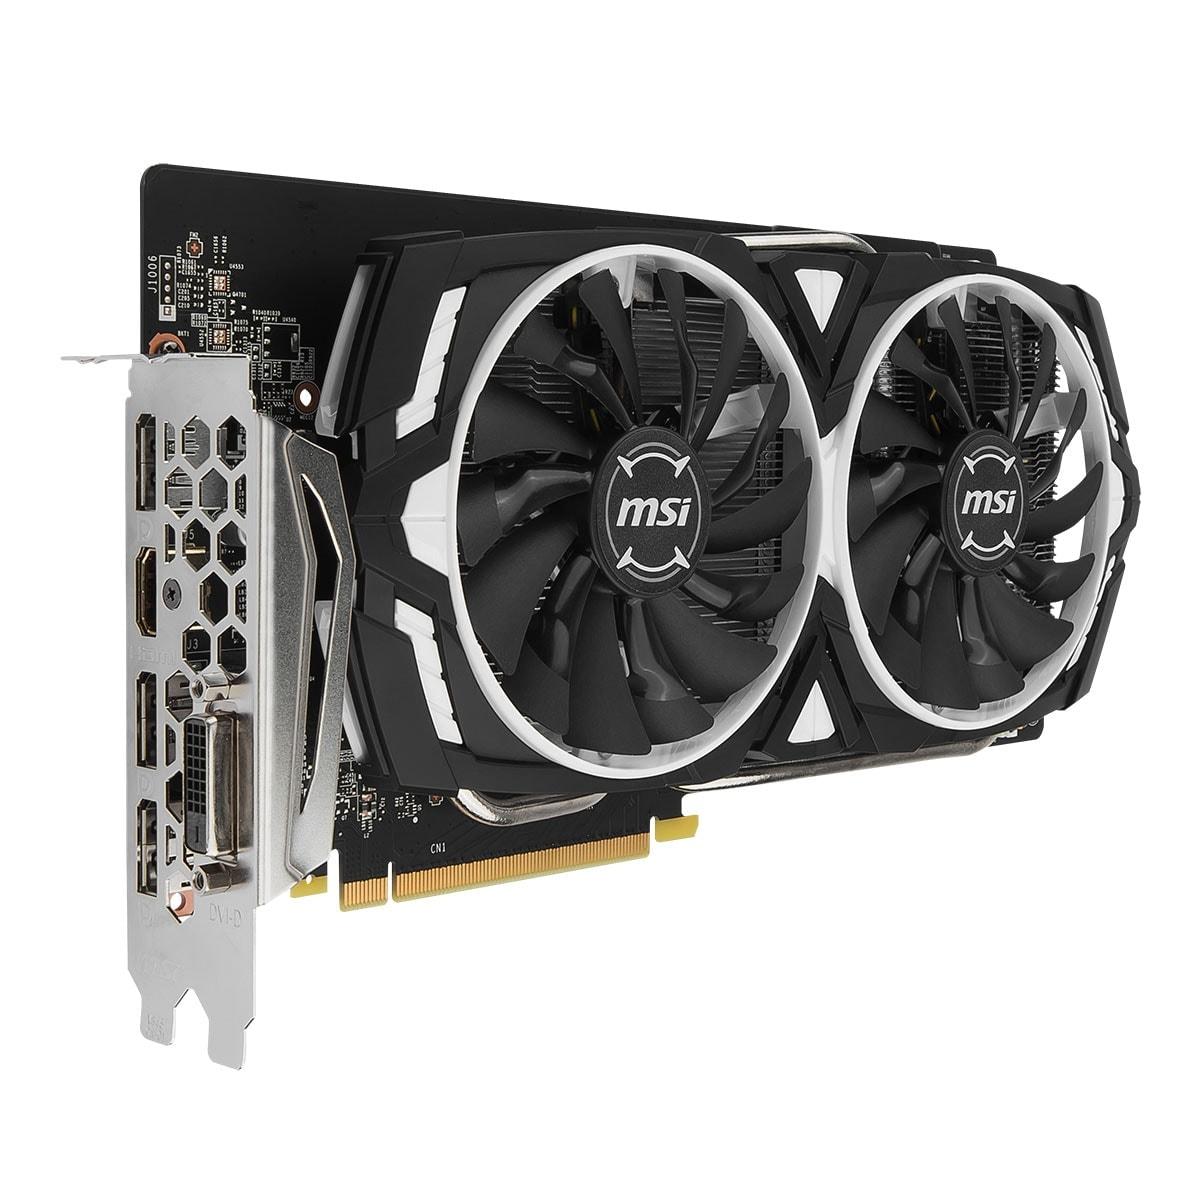 MSI GeForce GTX 1060 ARMOR 6G OCV1  (912-V328-028) - Achat / Vente Carte Graphique sur Cybertek.fr - 2